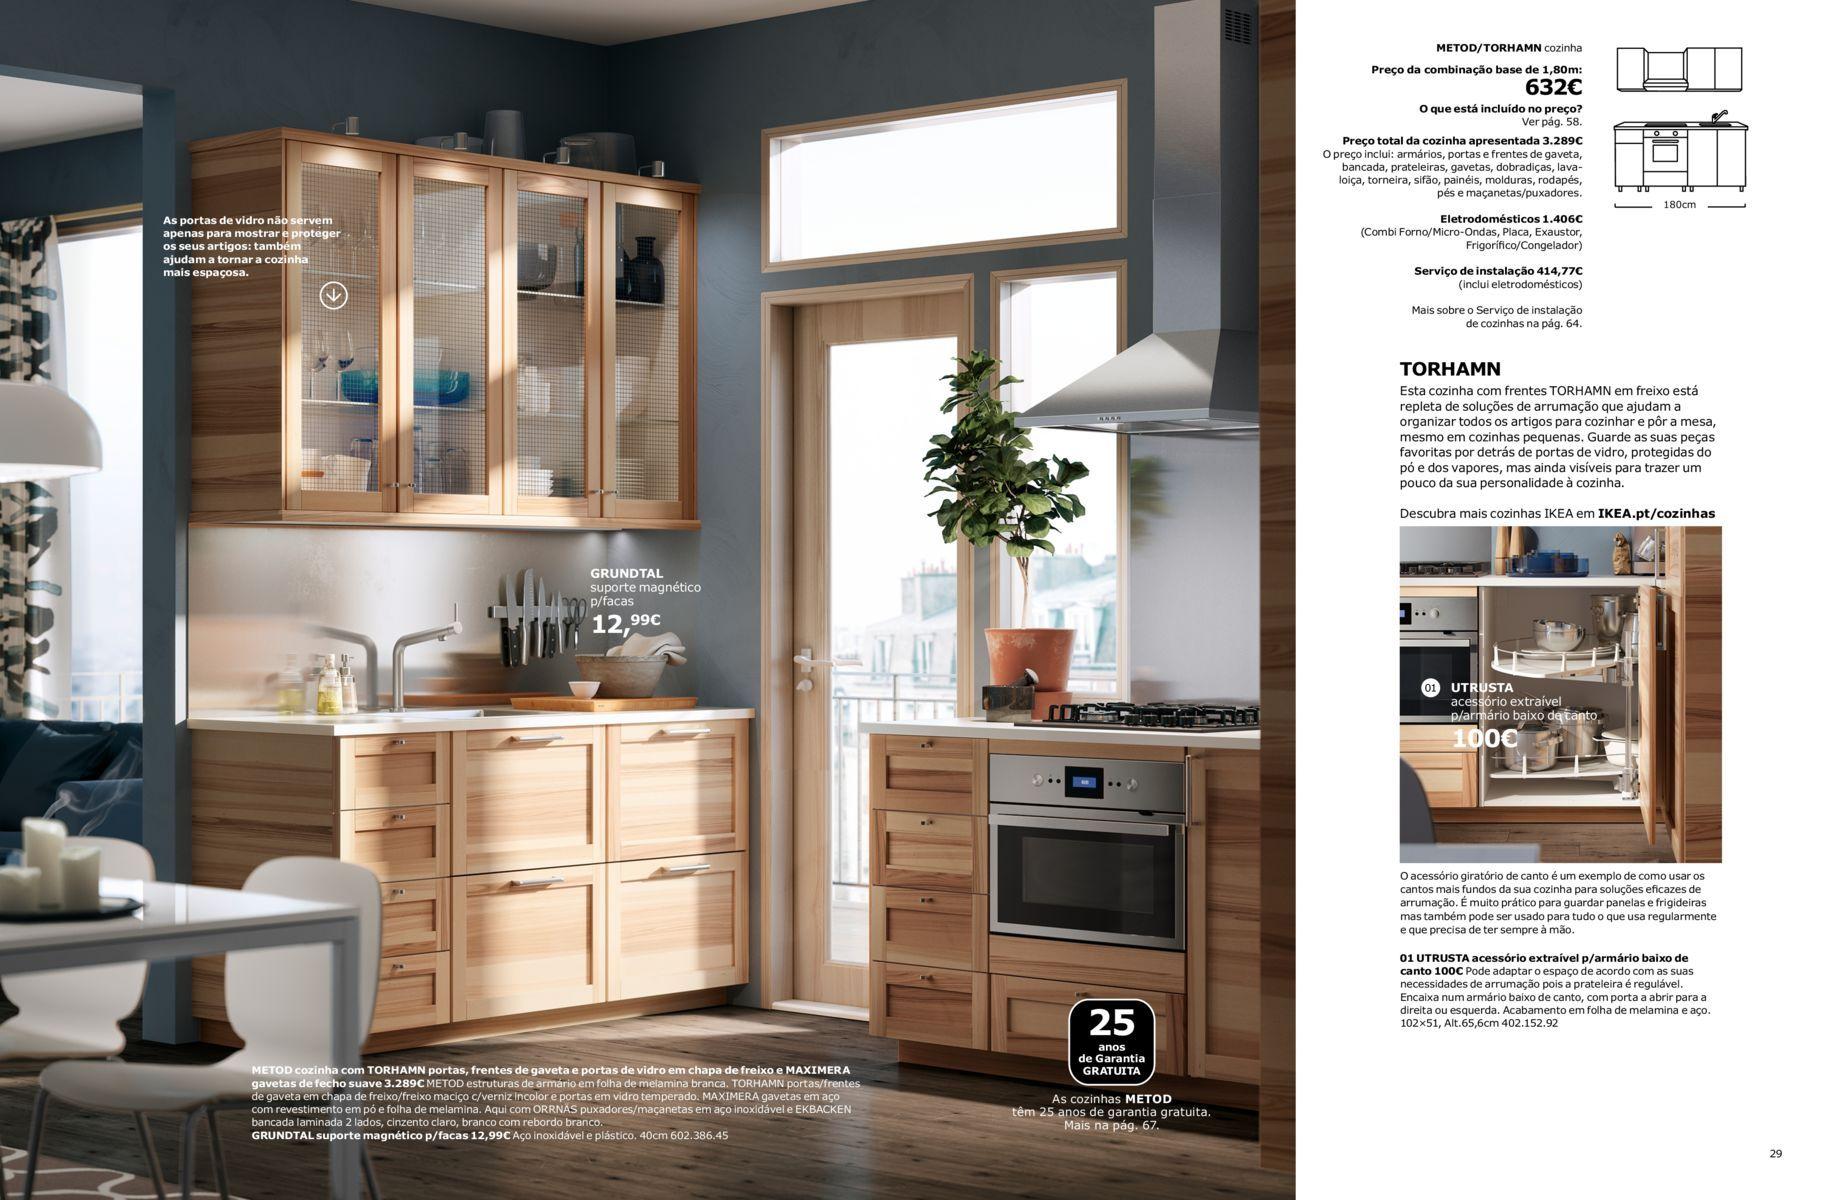 Armadi Ikea 2018 brochura cozinhas ikea 2018 | ikea keuken, keukens, ikea